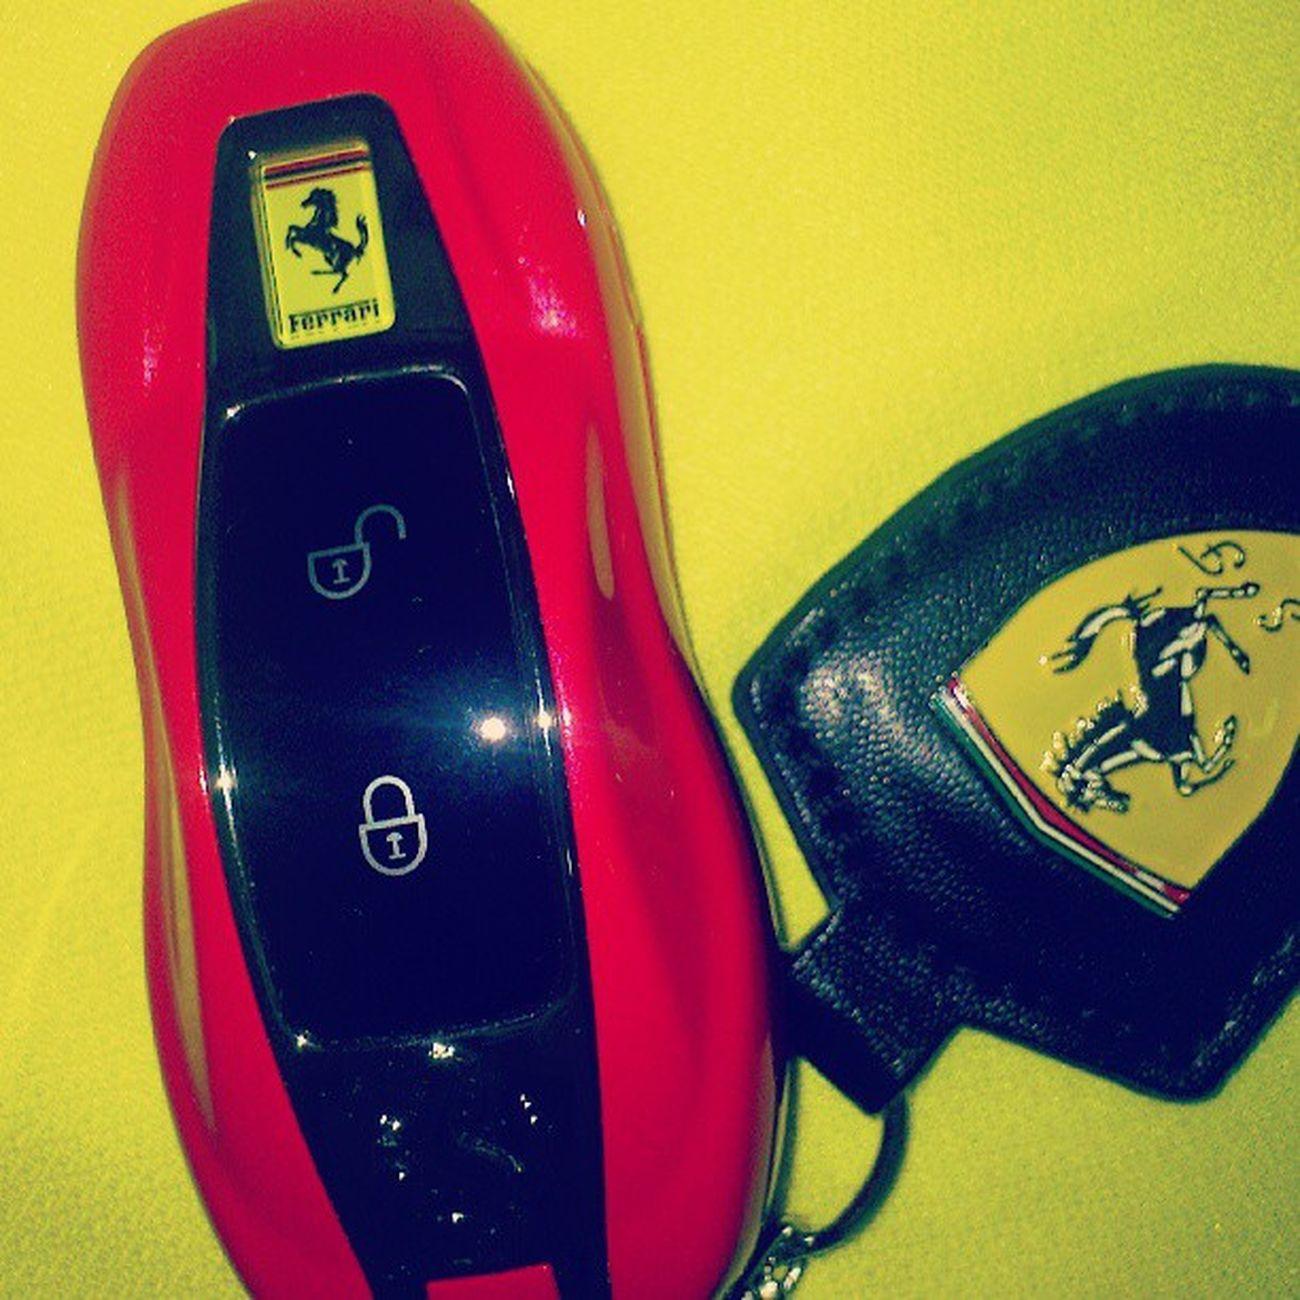 Ferrari ::::::::D